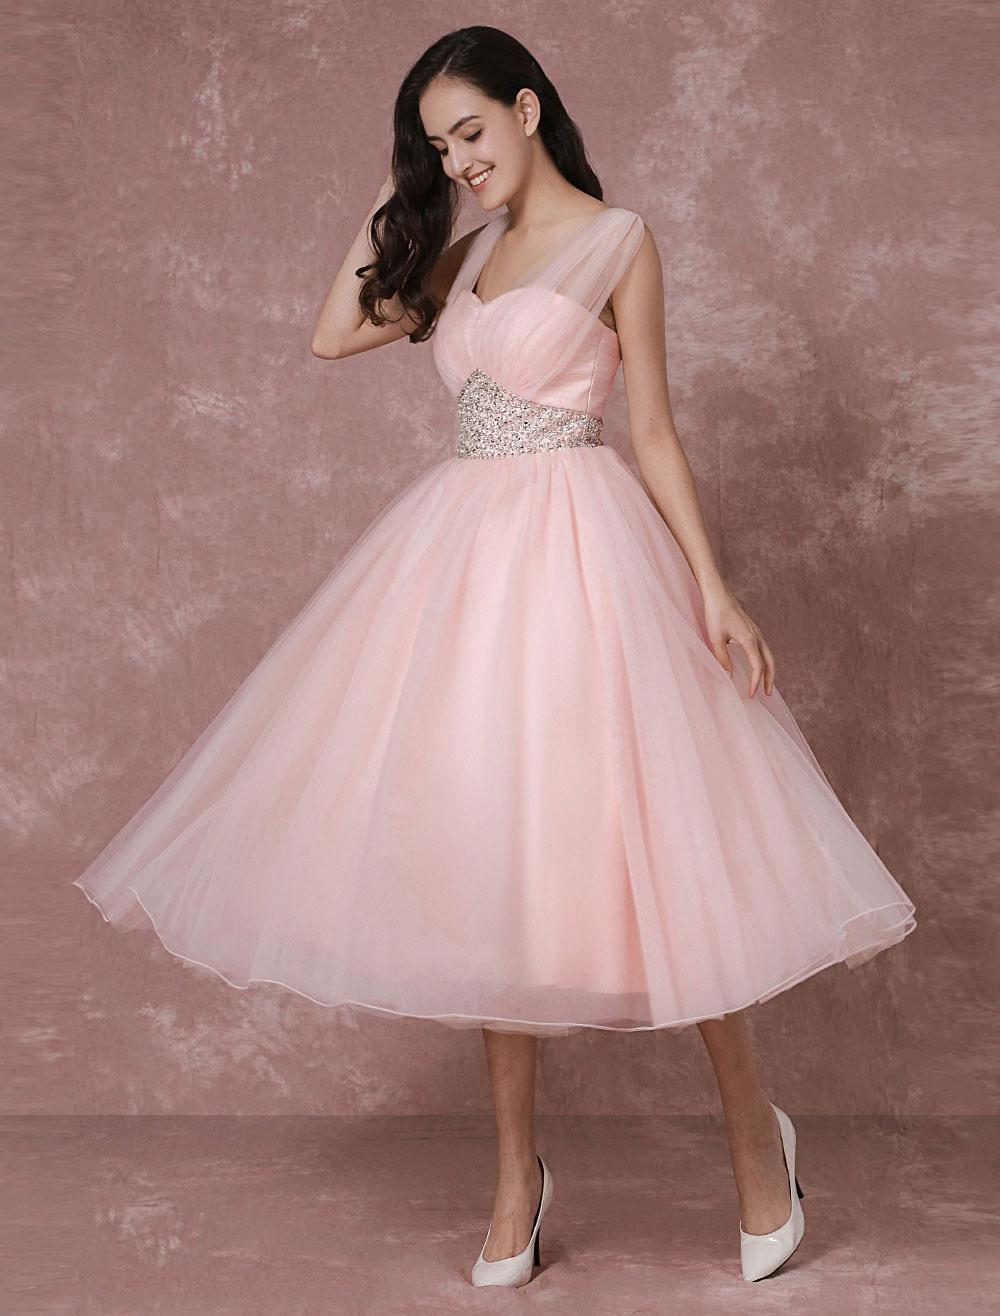 Tulle Wedding Dress Pink Bridal Dress Short Backless A Line Cocktail Dress Milanoo